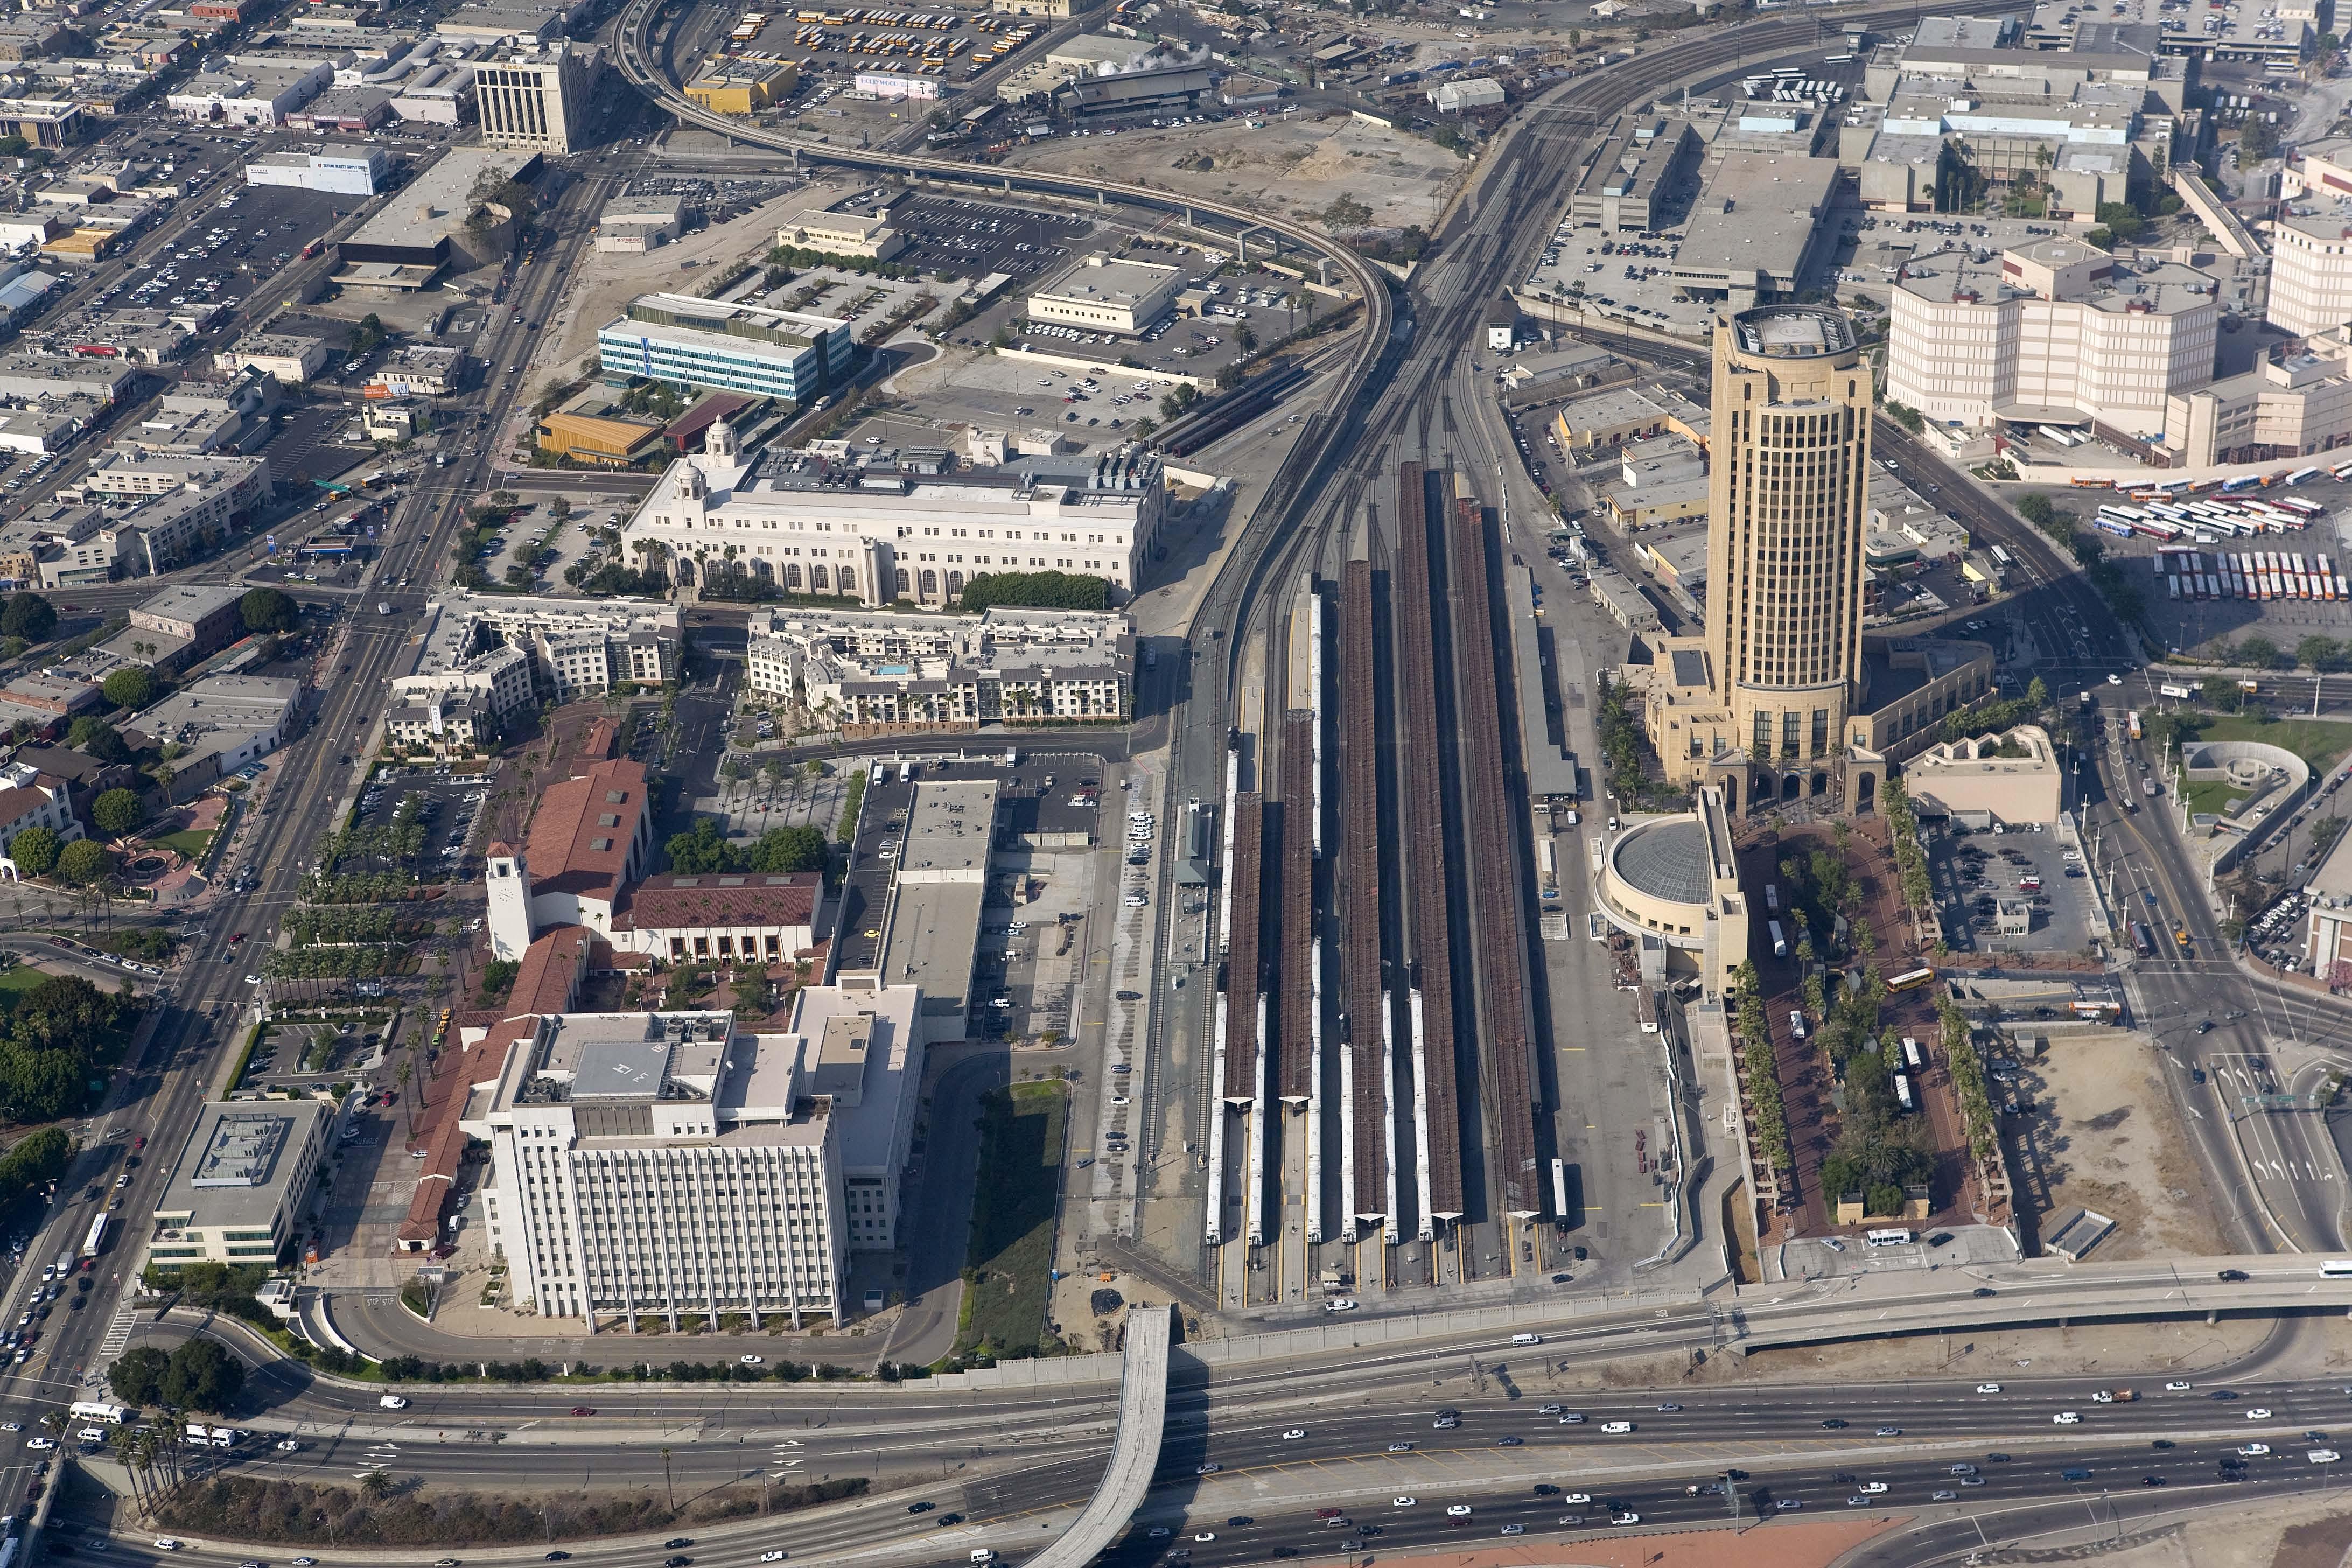 "<p>Aerial of Union Station</p> <p><span style=""font-family: Verdana, Geneva, sans-serif; line-height: 20px; font-size: small;"">Photograph Courtesy of Cattelus © 2011</span></p>"